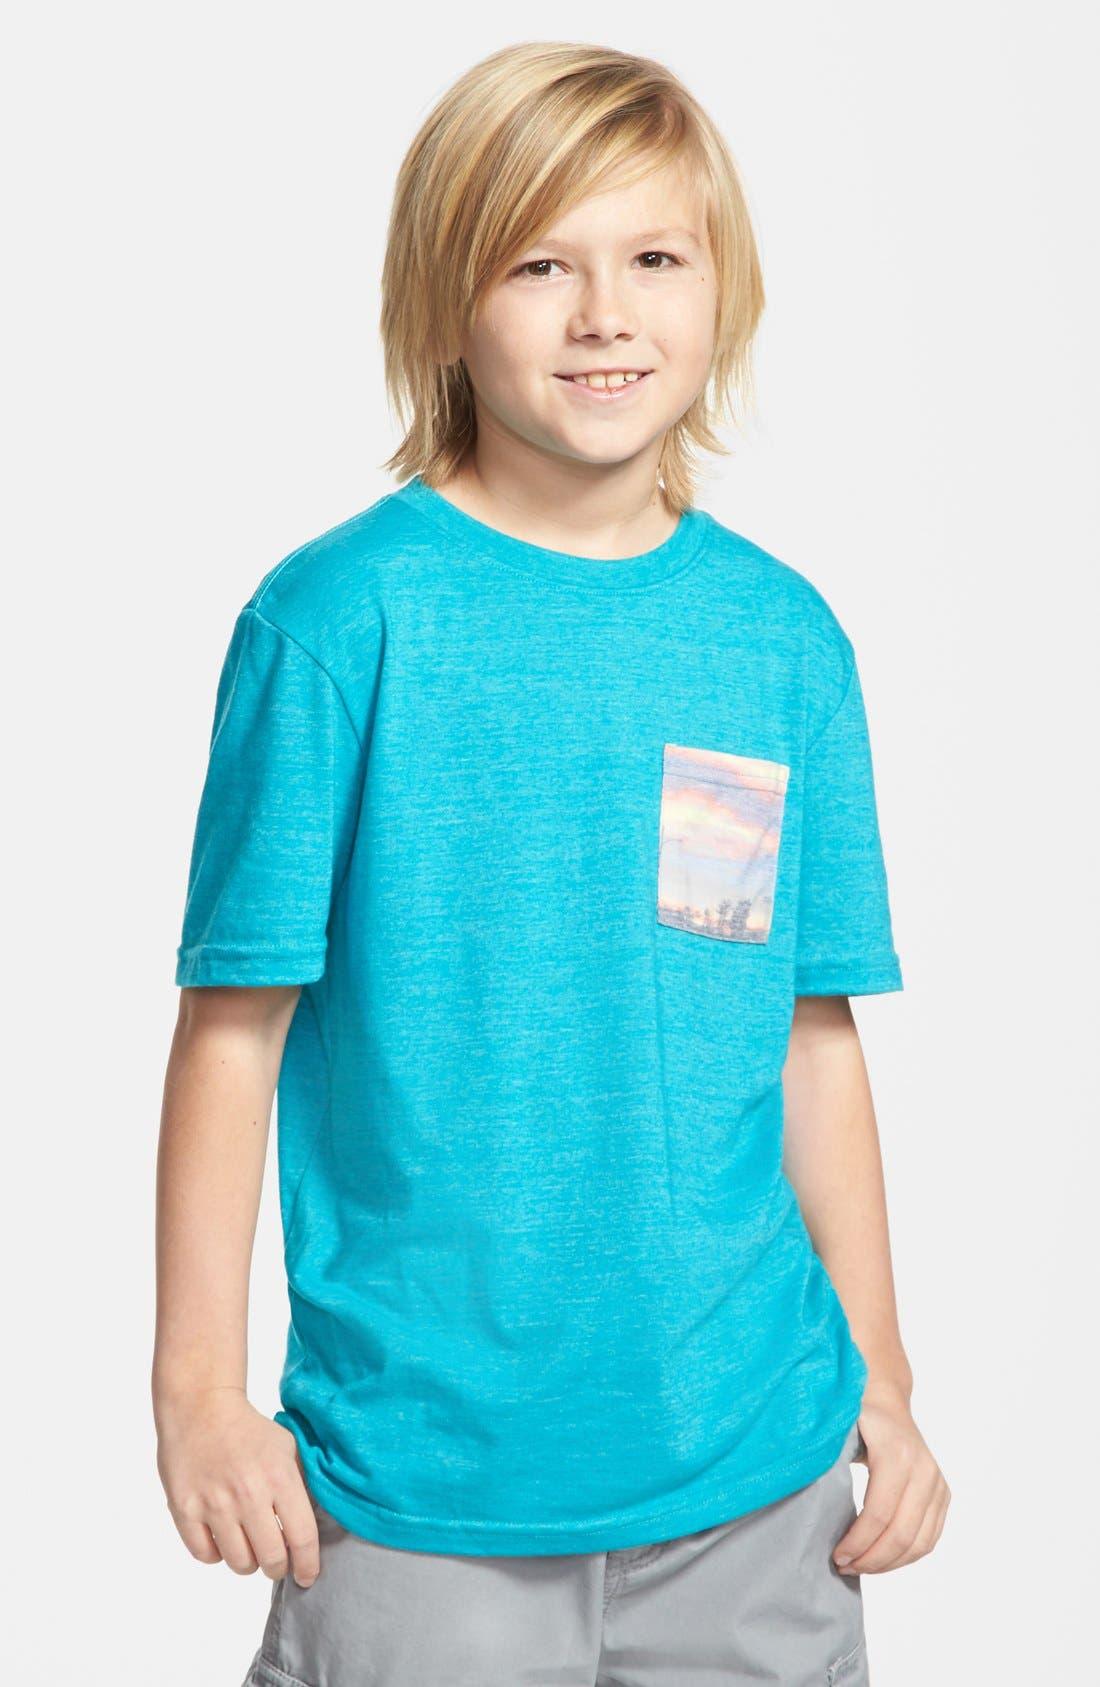 Alternate Image 1 Selected - Tucker + Tate 'Marc Sublimation' Pocket T-Shirt (Big Boys)